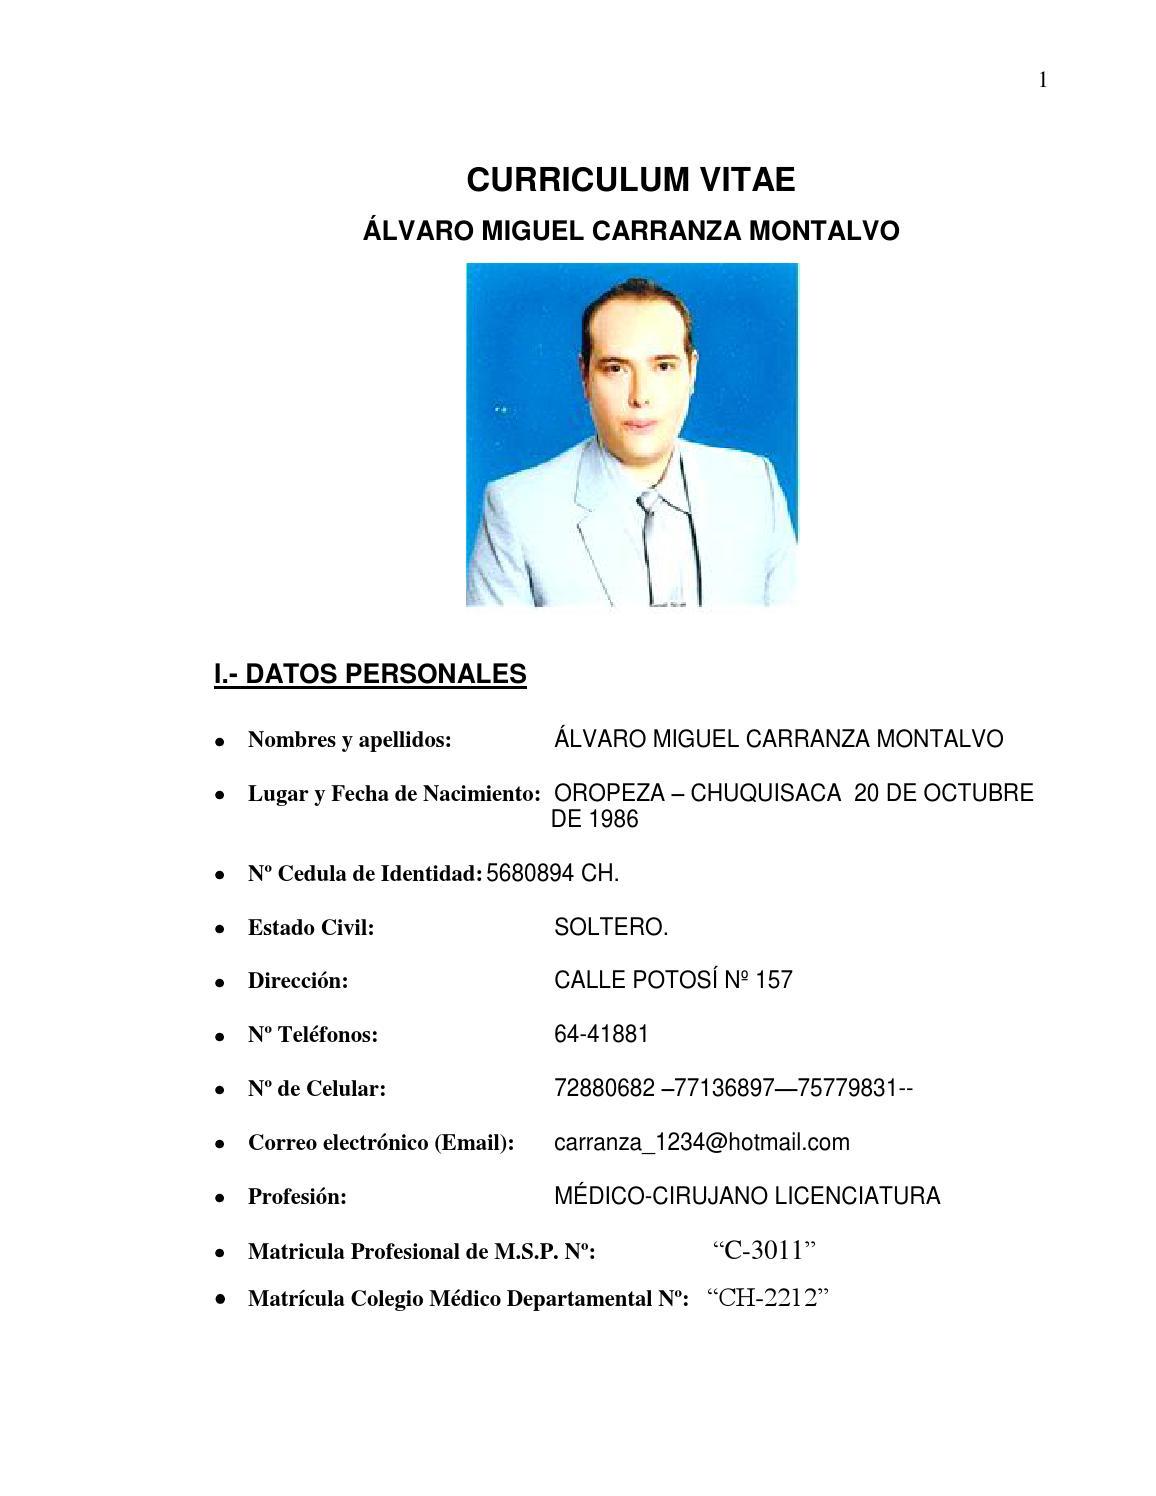 curriculum vitae hoja de vida by alvaro carranza montalvo